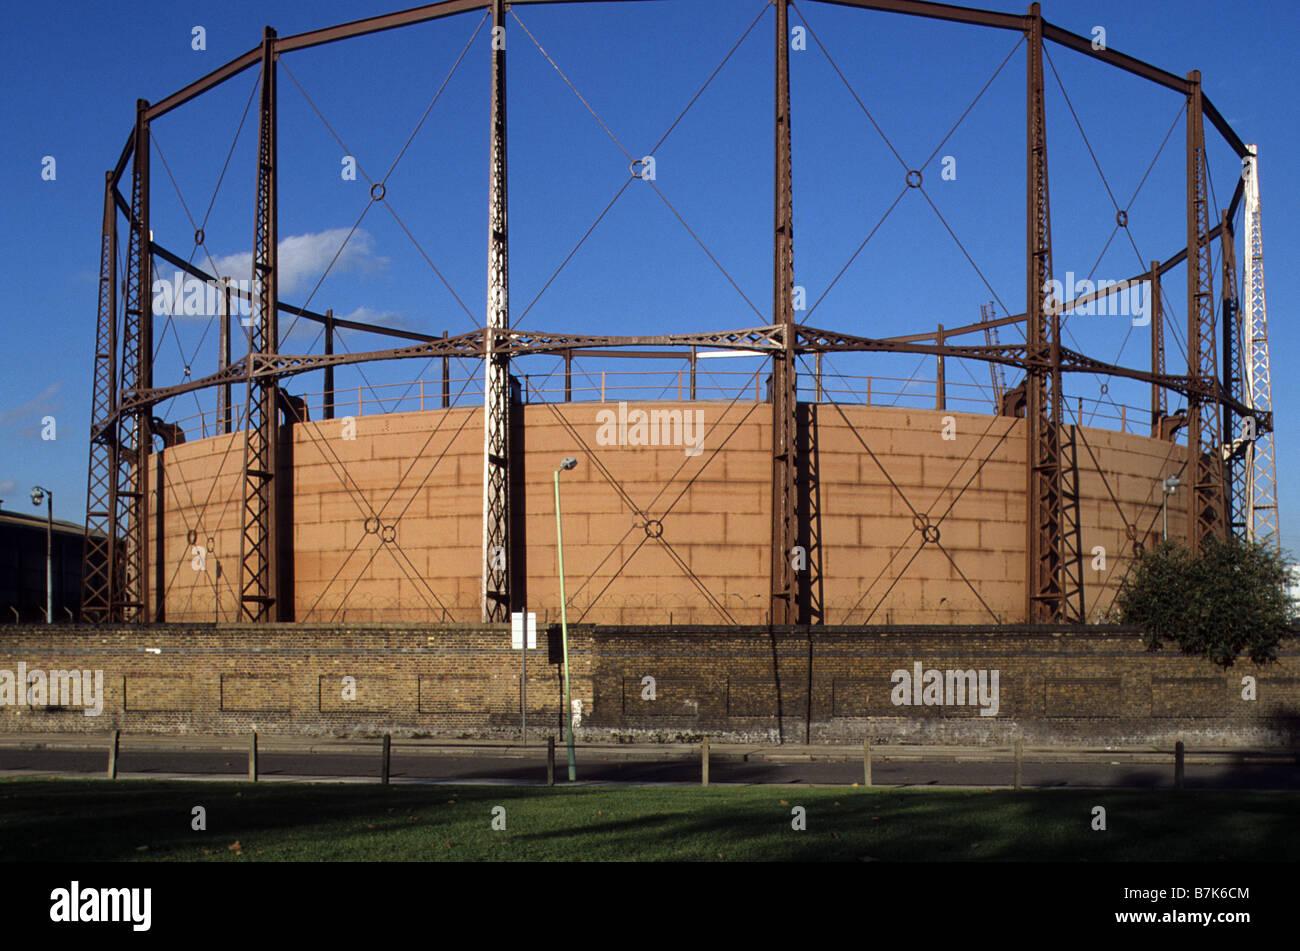 London Gas Works Stock Photos & London Gas Works Stock